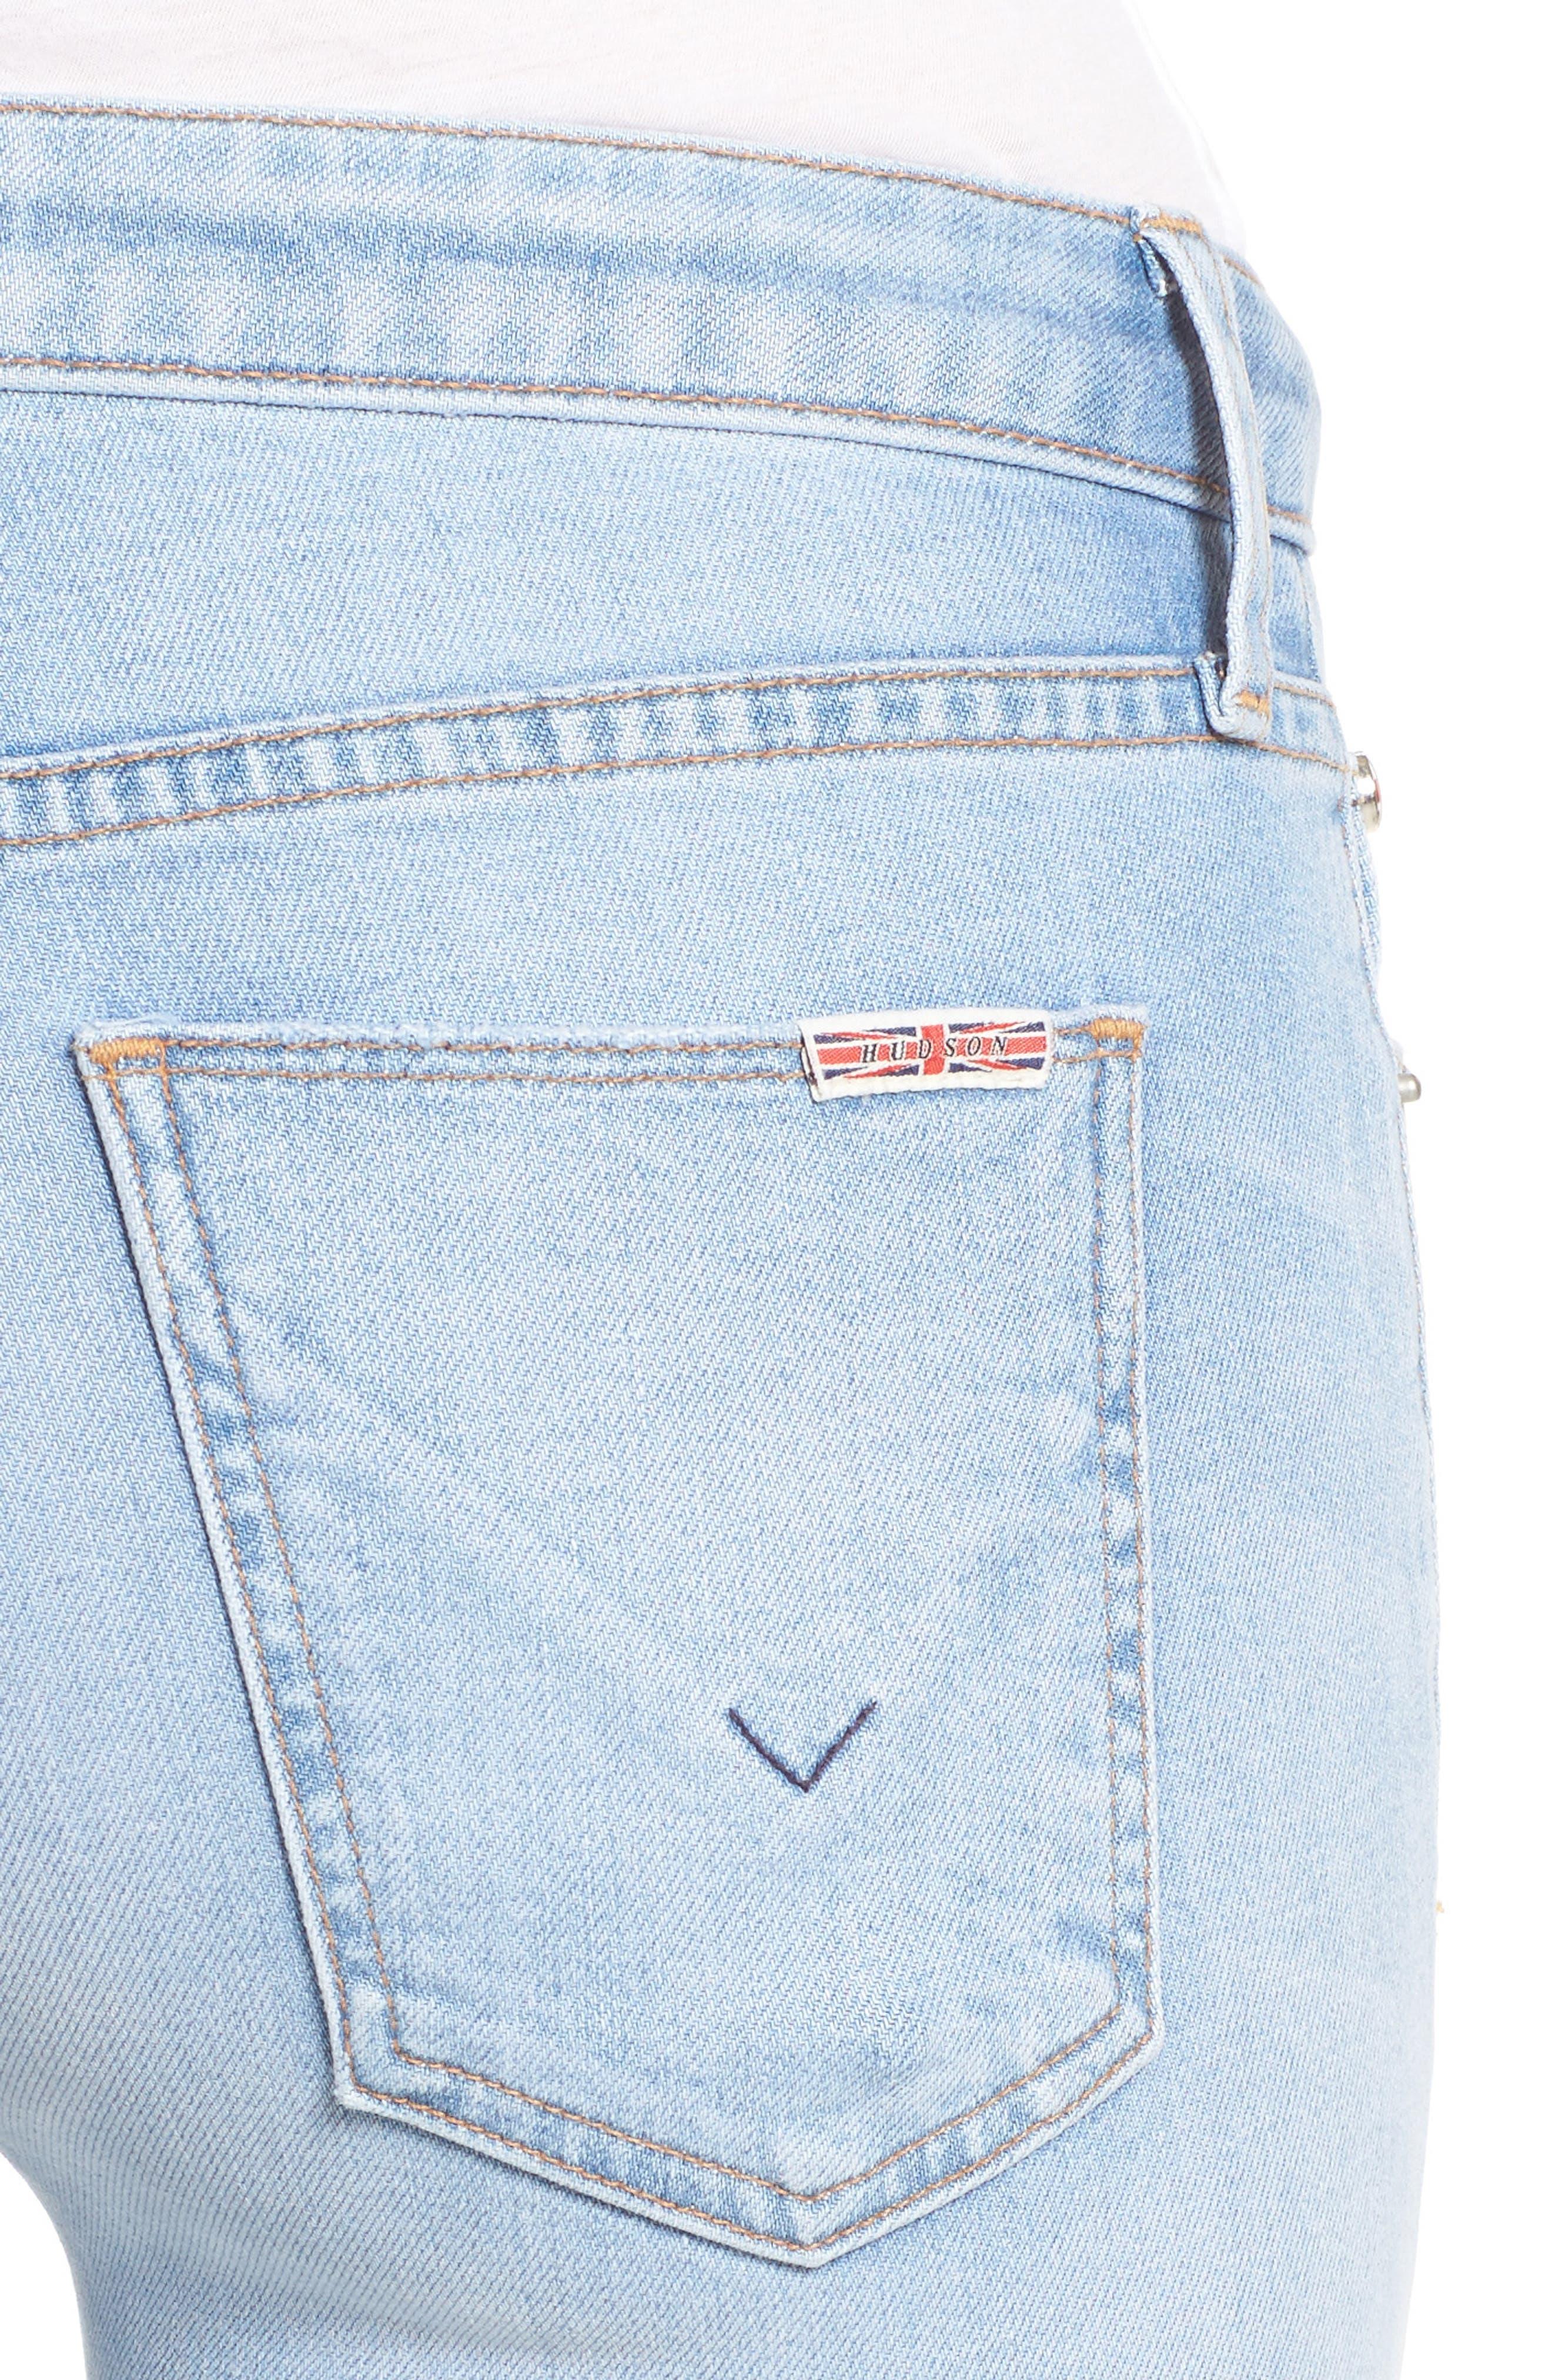 Alternate Image 4  - Hudson Jeans Mia Patchwork Flare Jeans (Royal Delta)